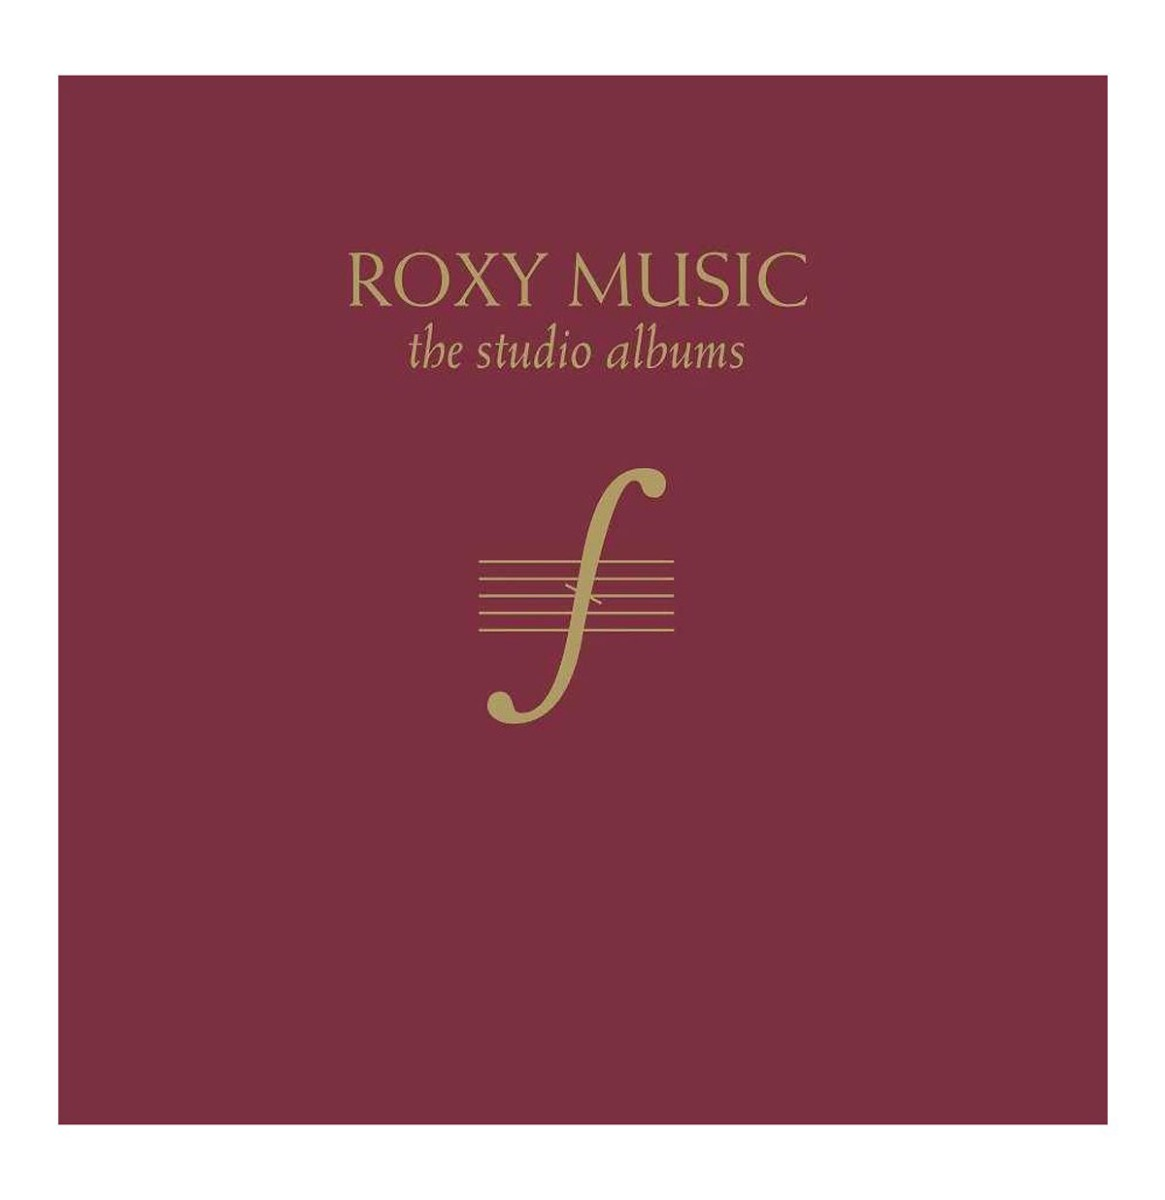 Roxy Music - The Studio Albums (Limited Edition Box Set)